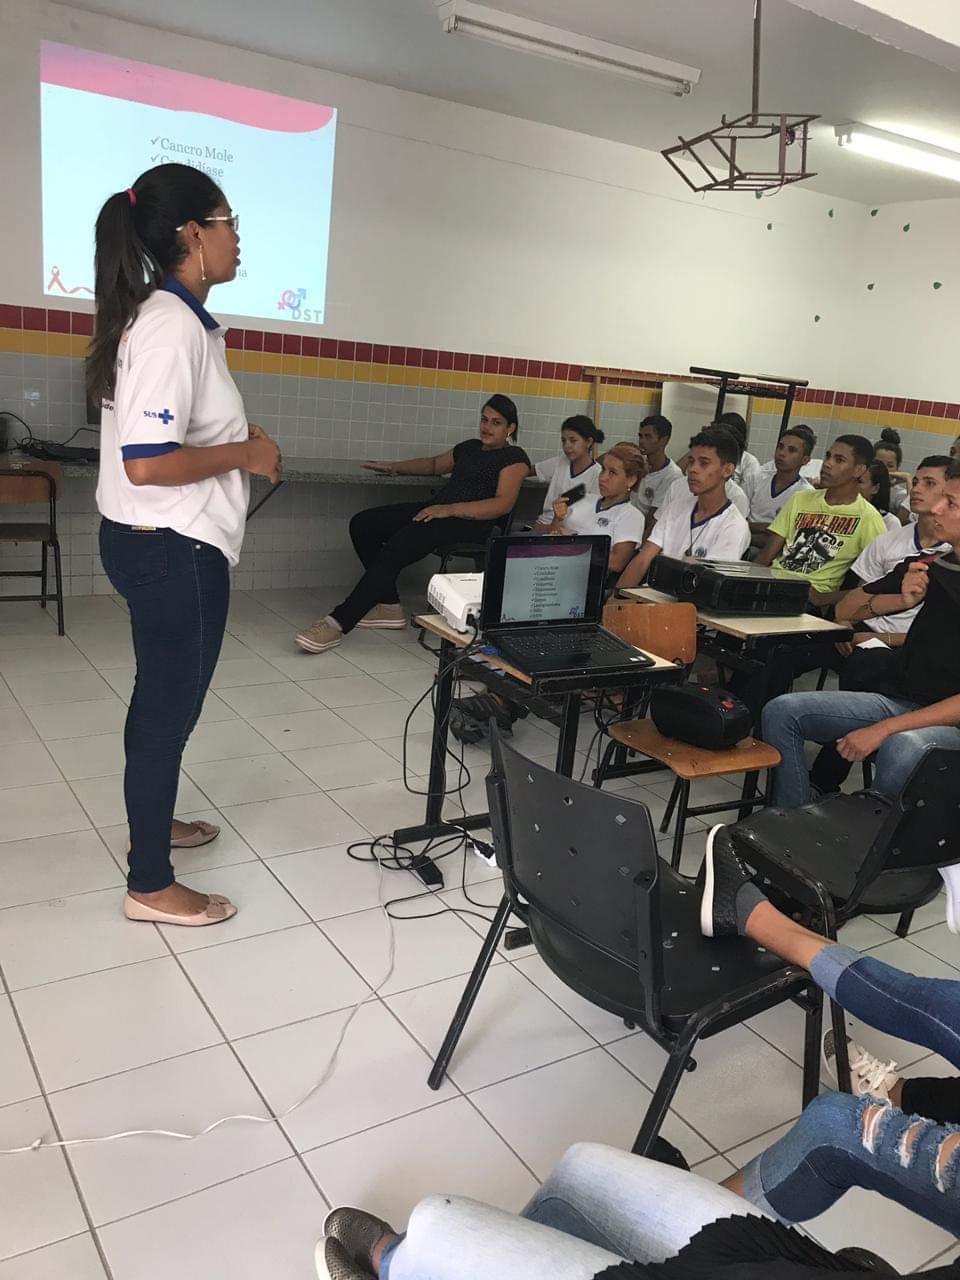 PROGRAMA SAÚDE NAS ESCOLAS - SECRETARIA DE SAÚDE REALIZA PALESTRA SOBRE DST